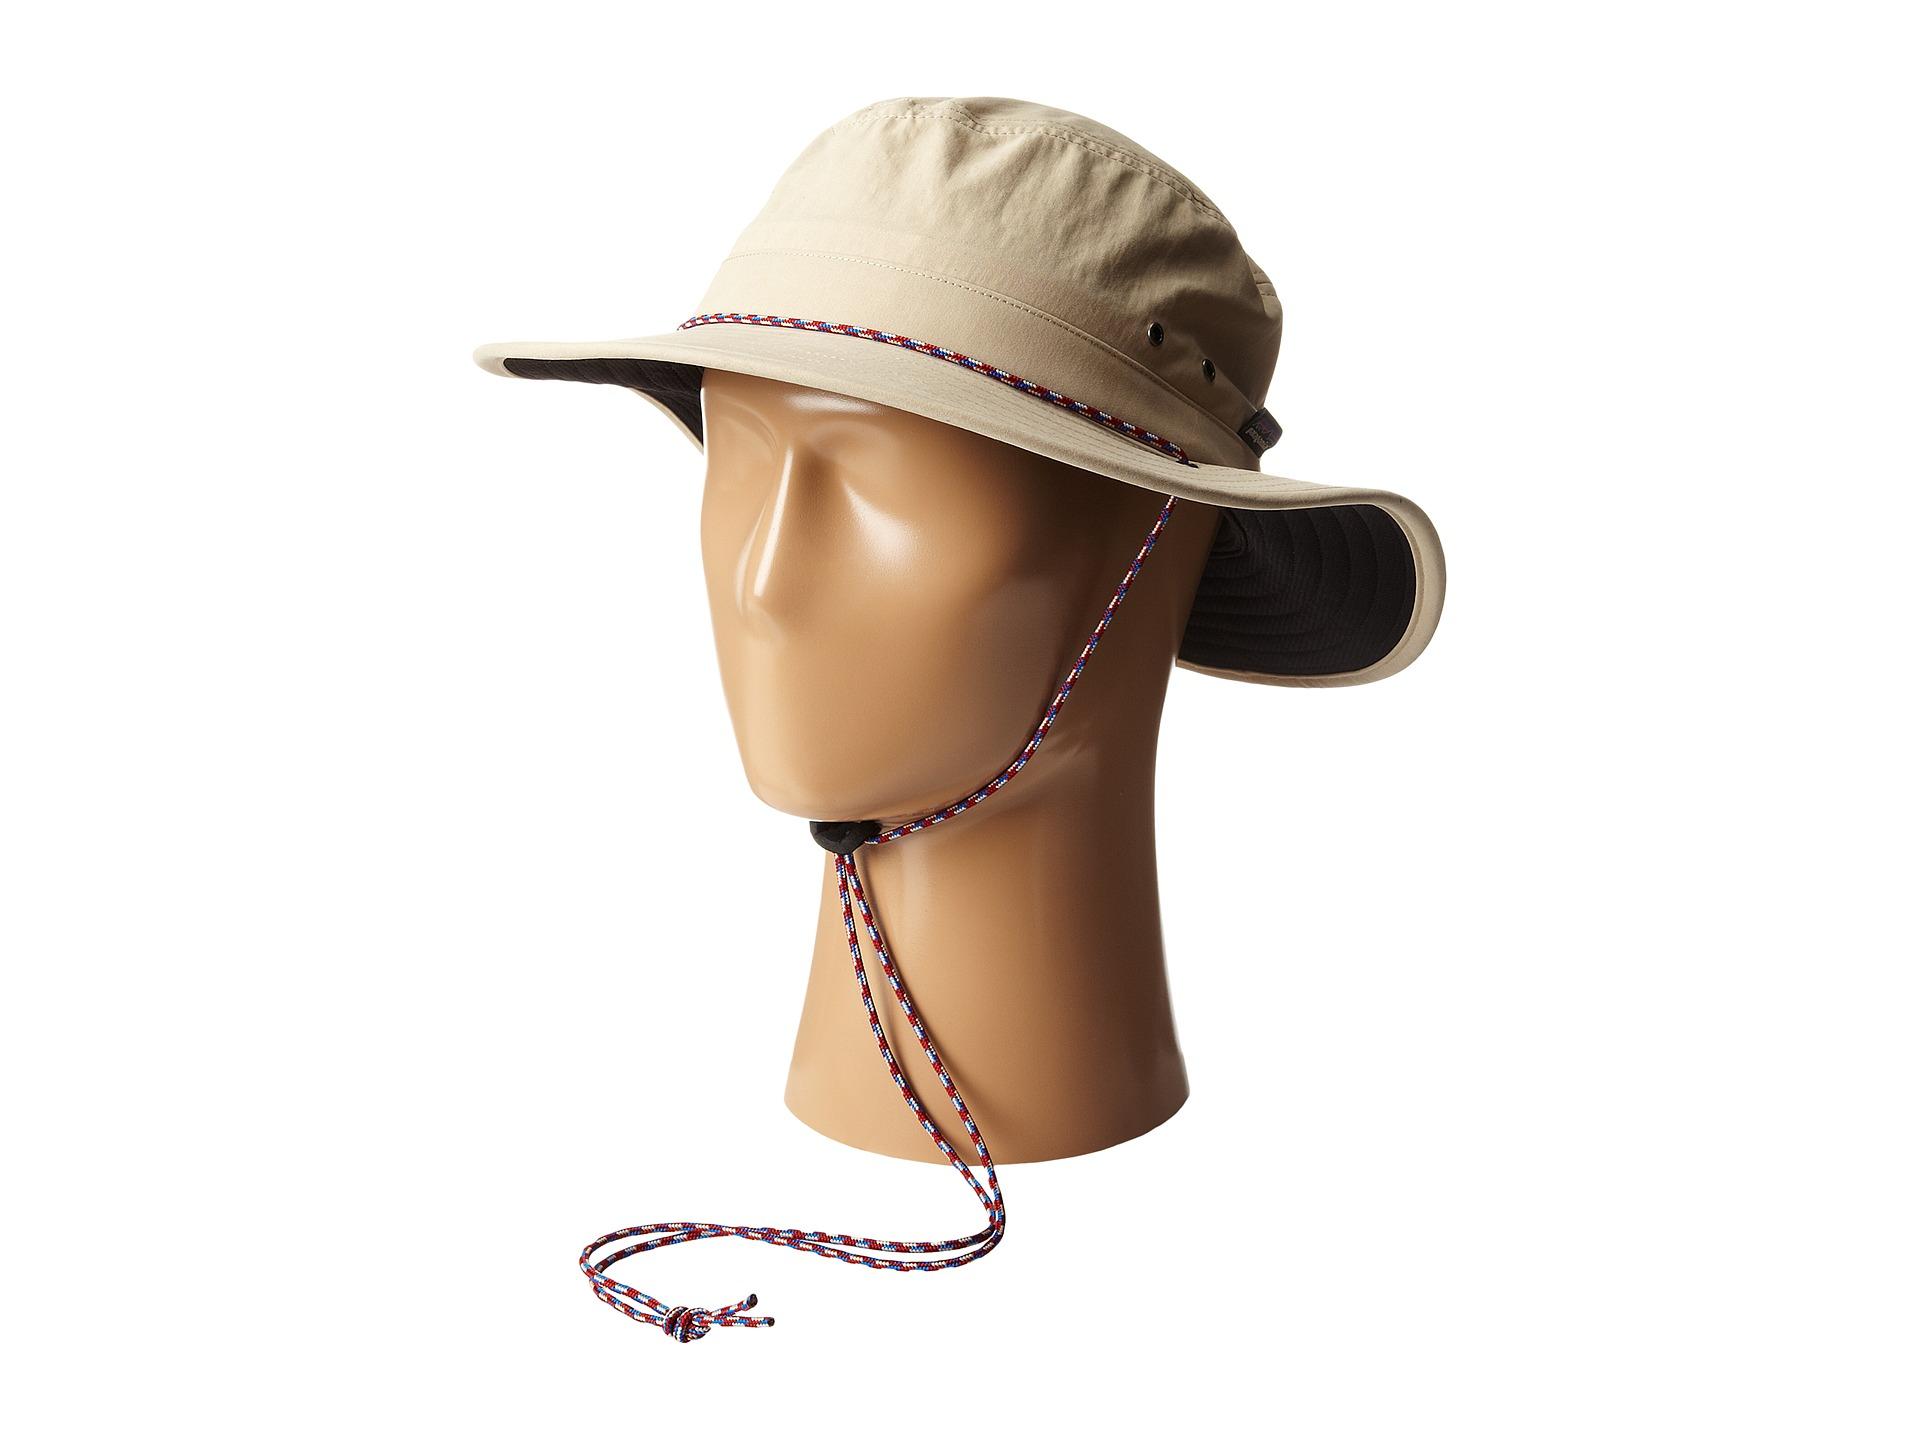 Lyst - Patagonia Tenpenny Hat in Natural 2835ecf6fef4